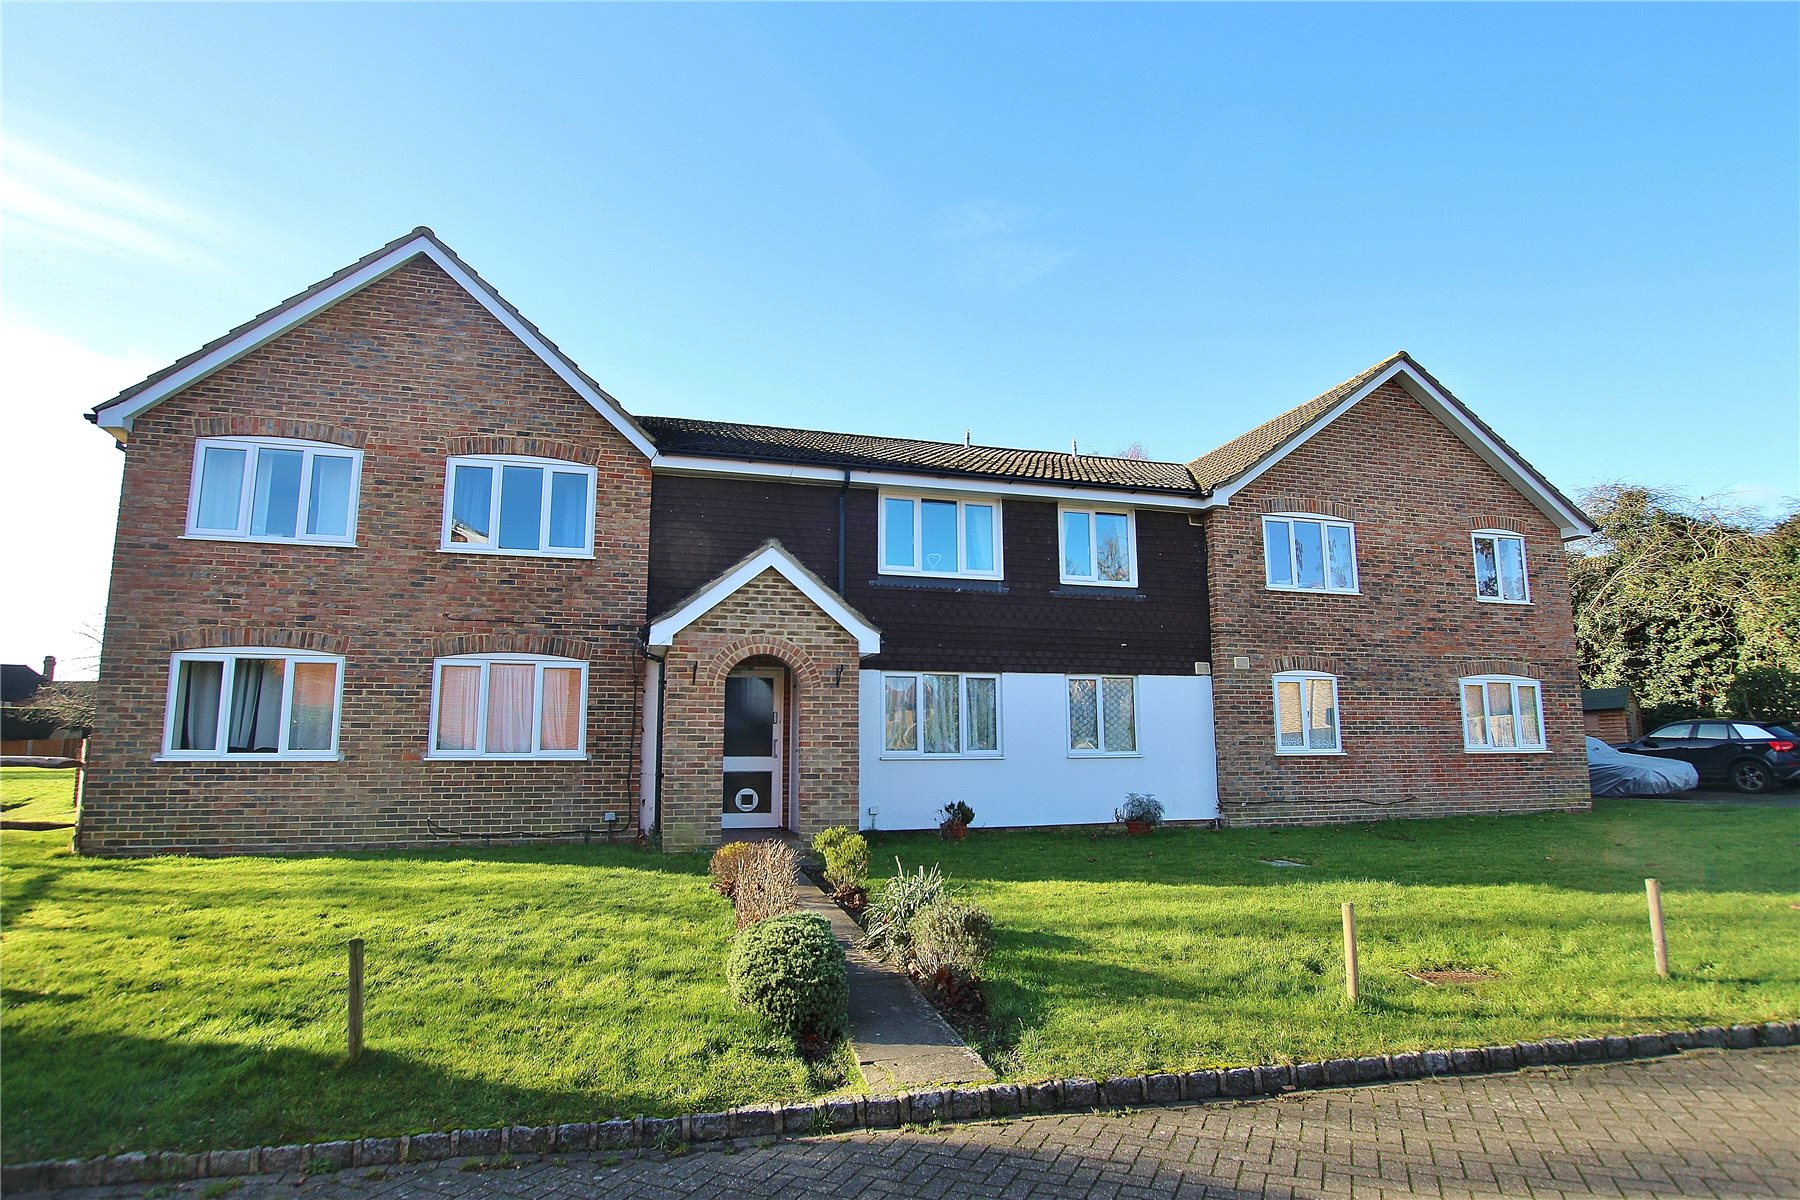 1 Bedroom Apartment Flat for sale in Rosebury Drive, Bisley, Woking, Surrey, GU24